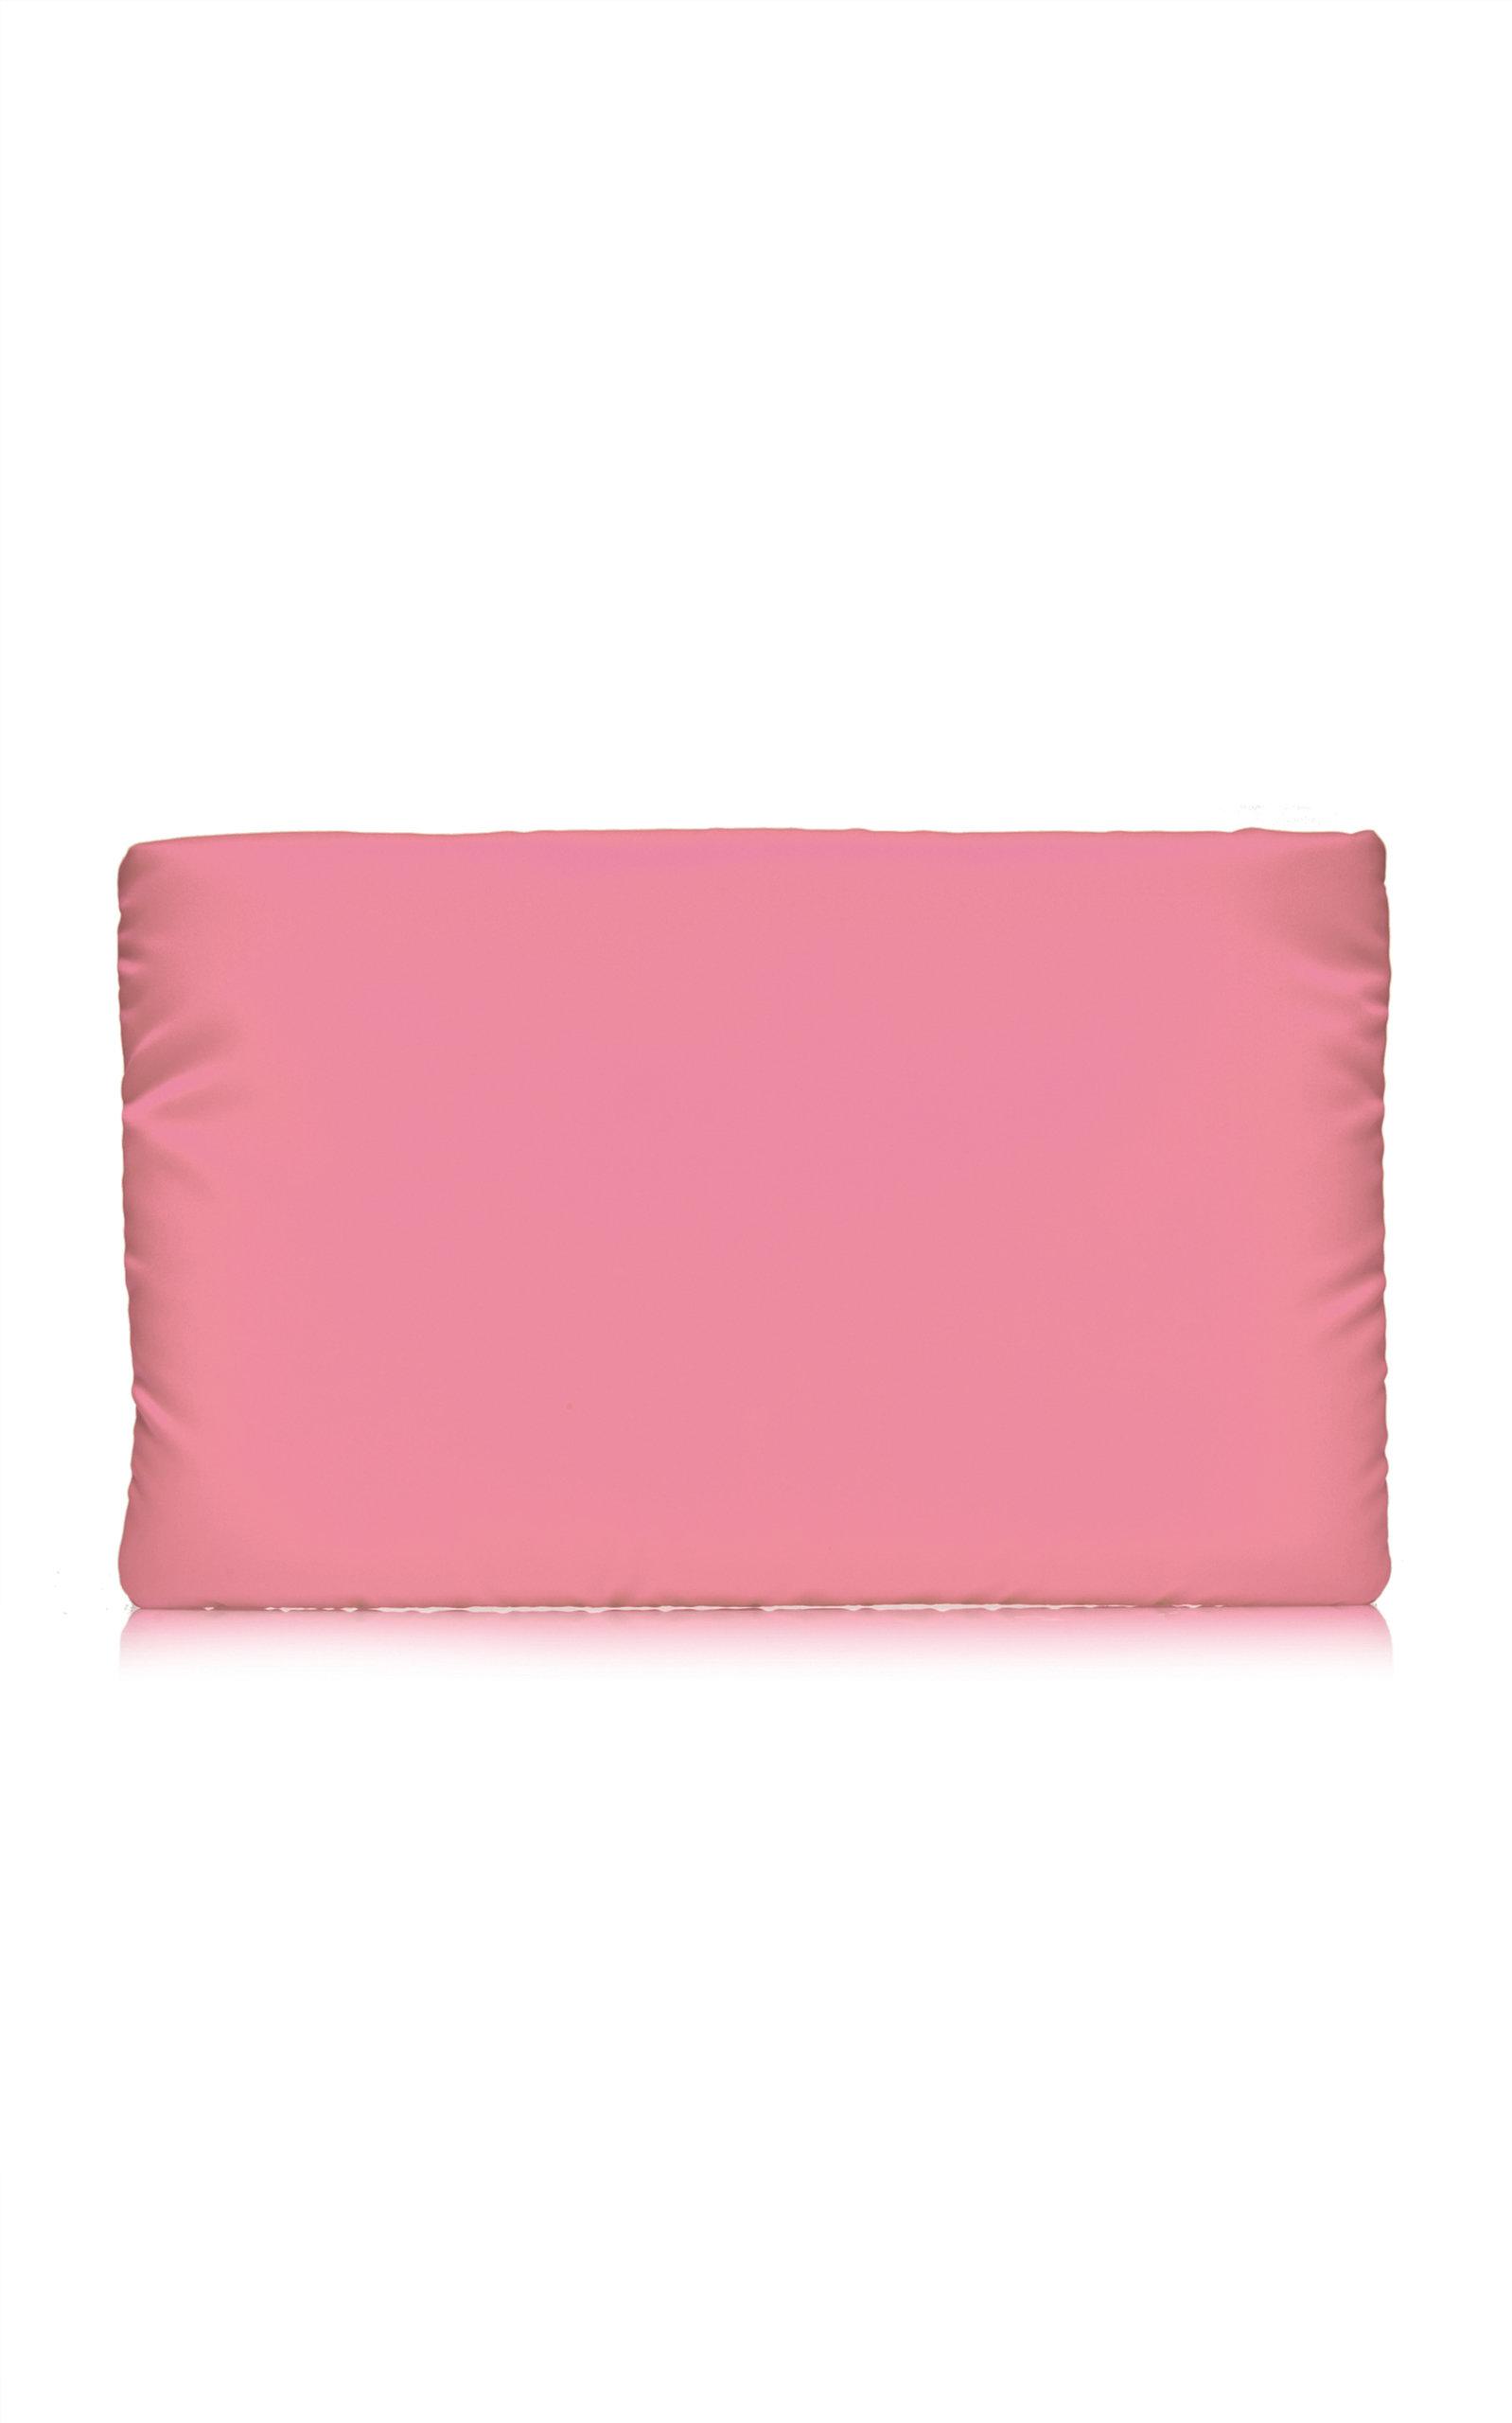 Medium Tessuto Soft Pouch Prada bKROkSJ